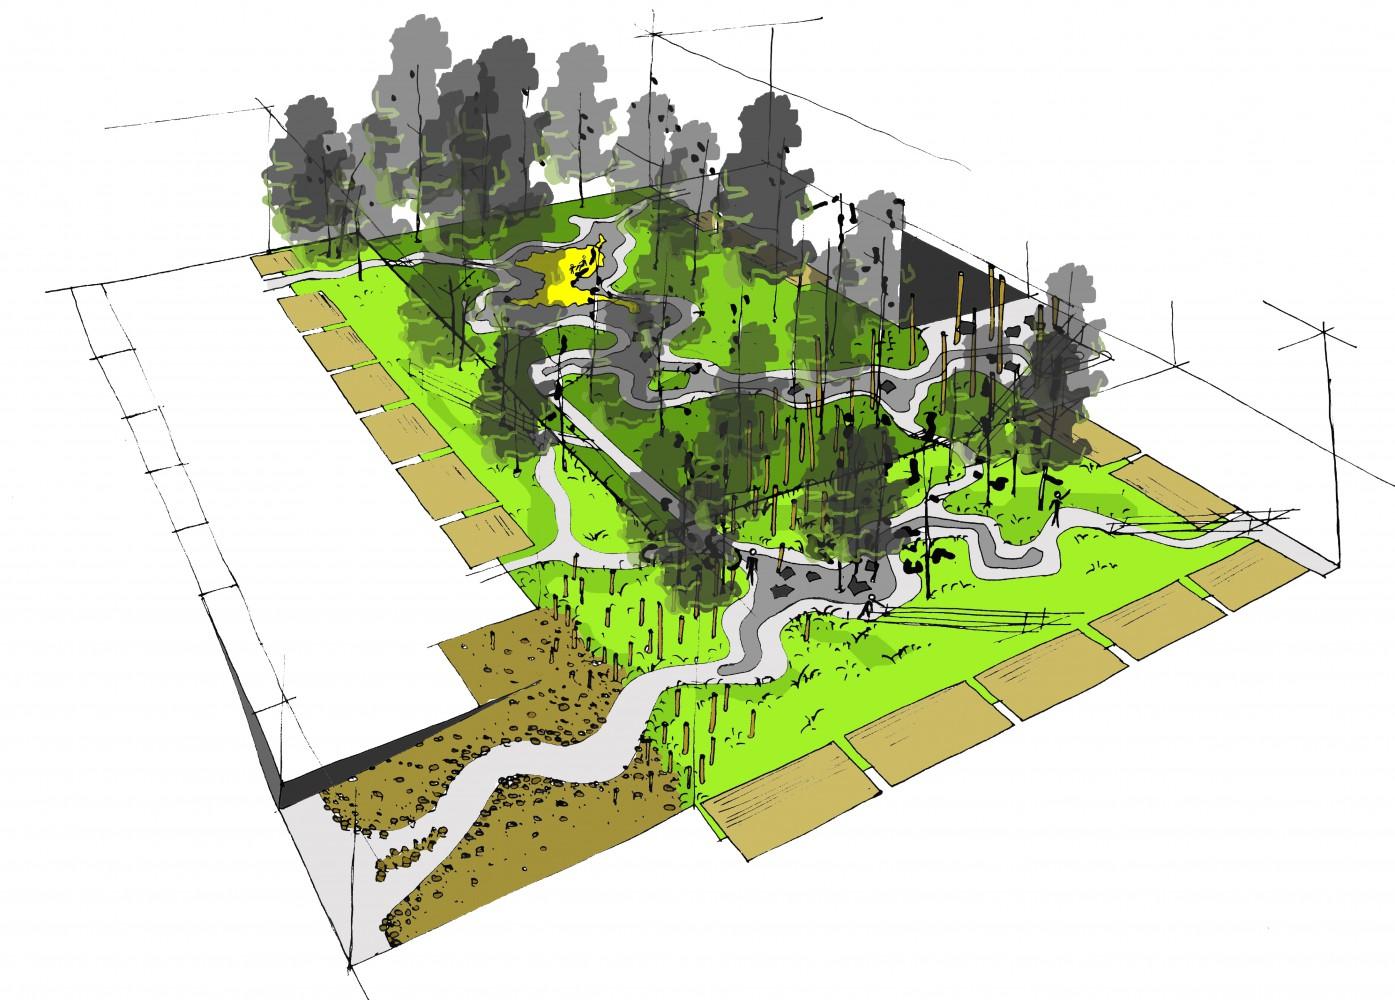 buro-sant-en-co-landschapsarchitectuur-Masira-Amsterdam-Hof-C